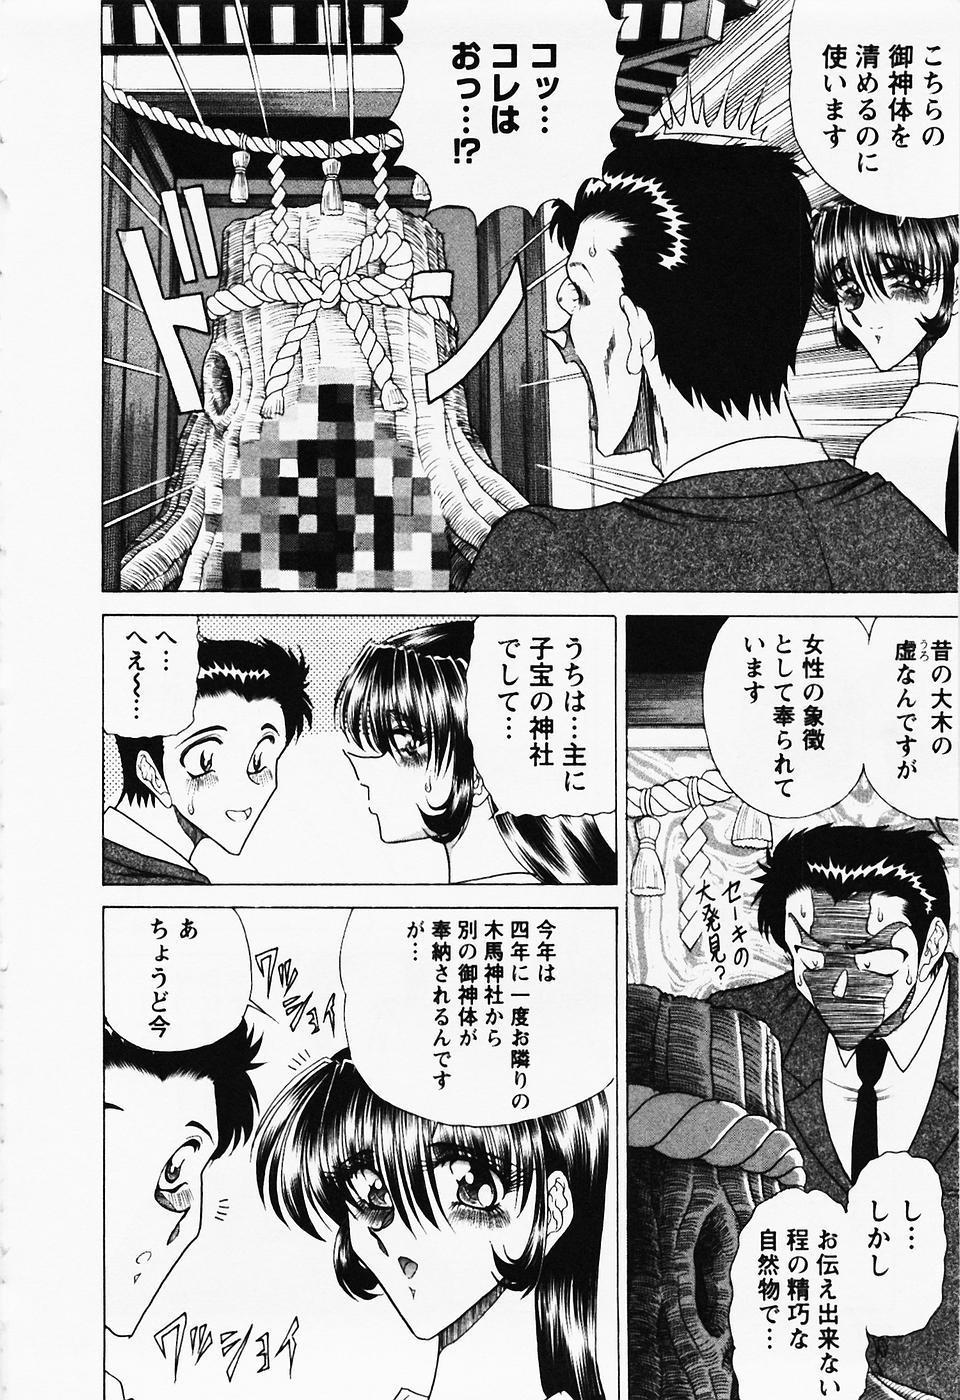 Seifuku Zanmai 186